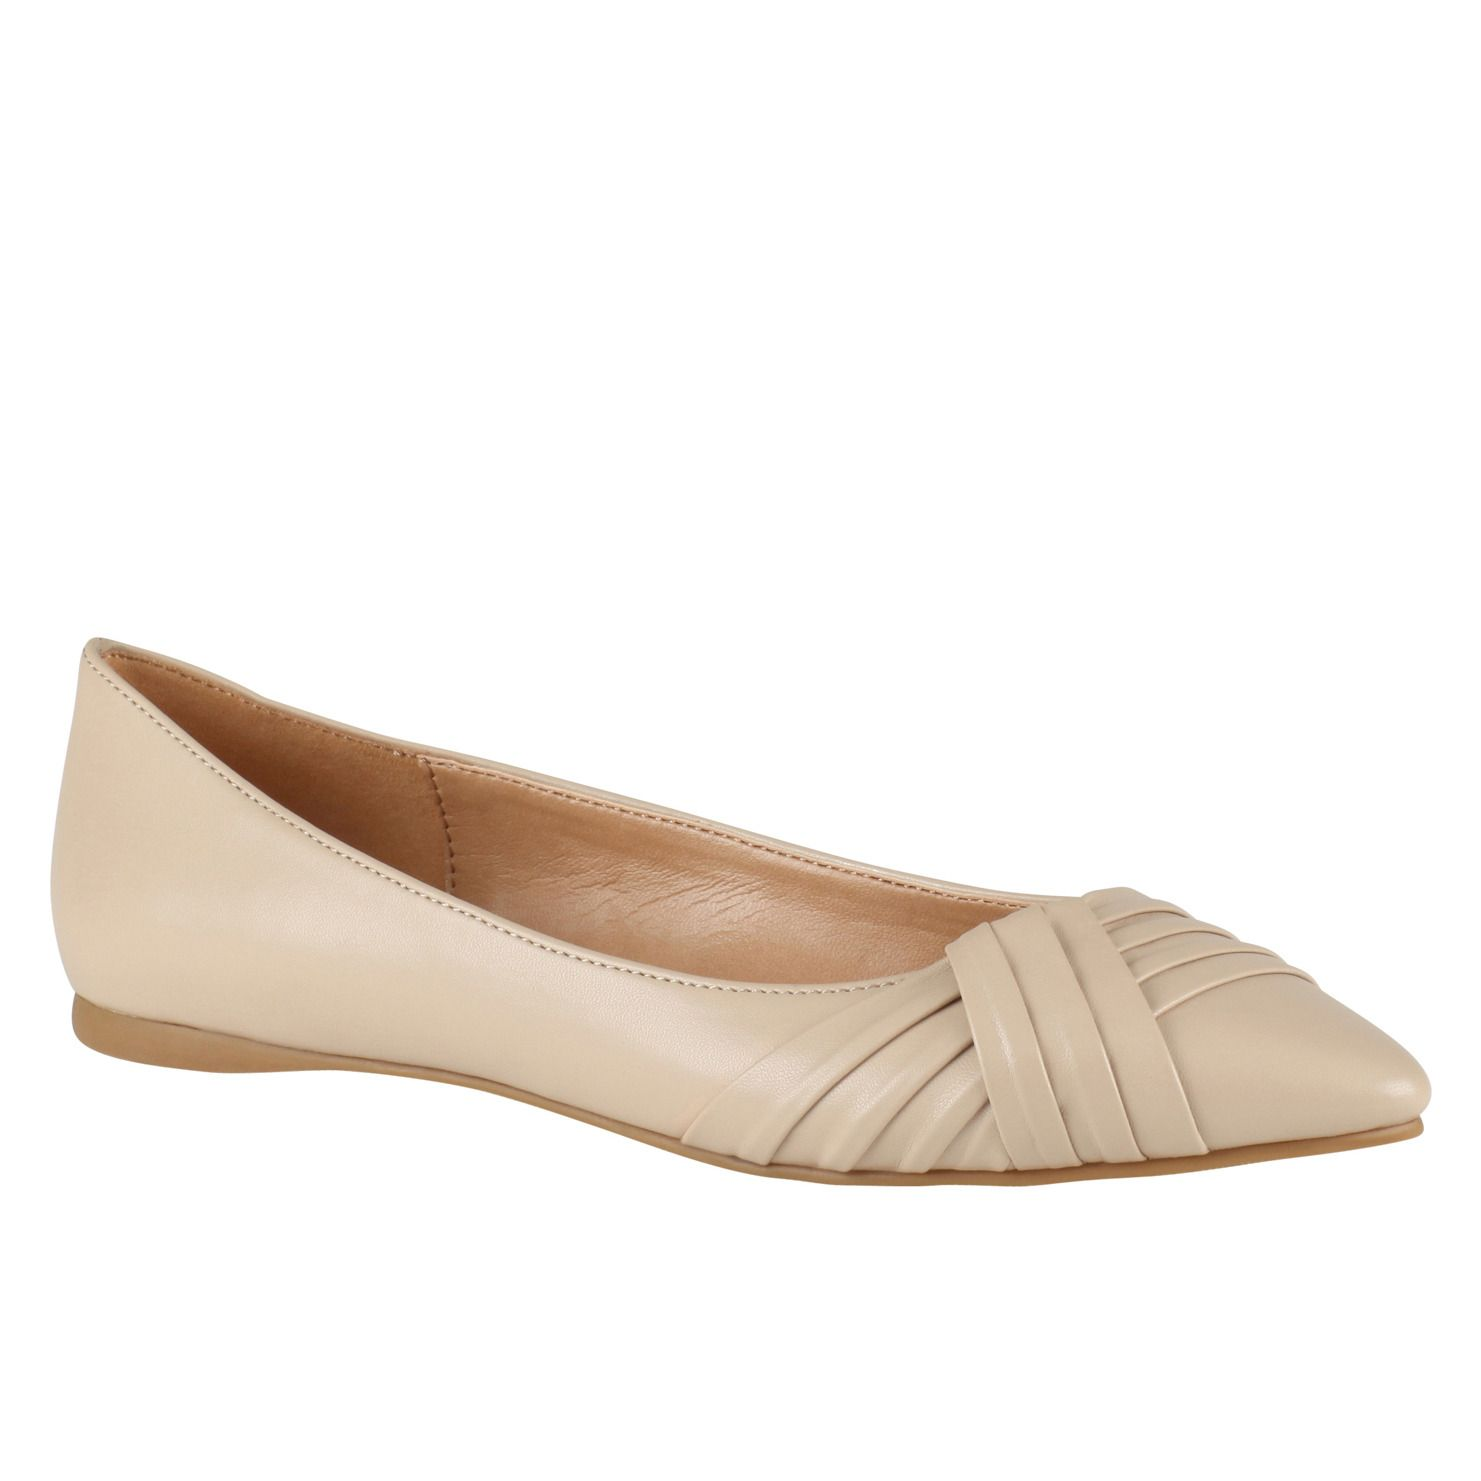 MARTINIK - women's flats shoes for sale at ALDO Shoes.